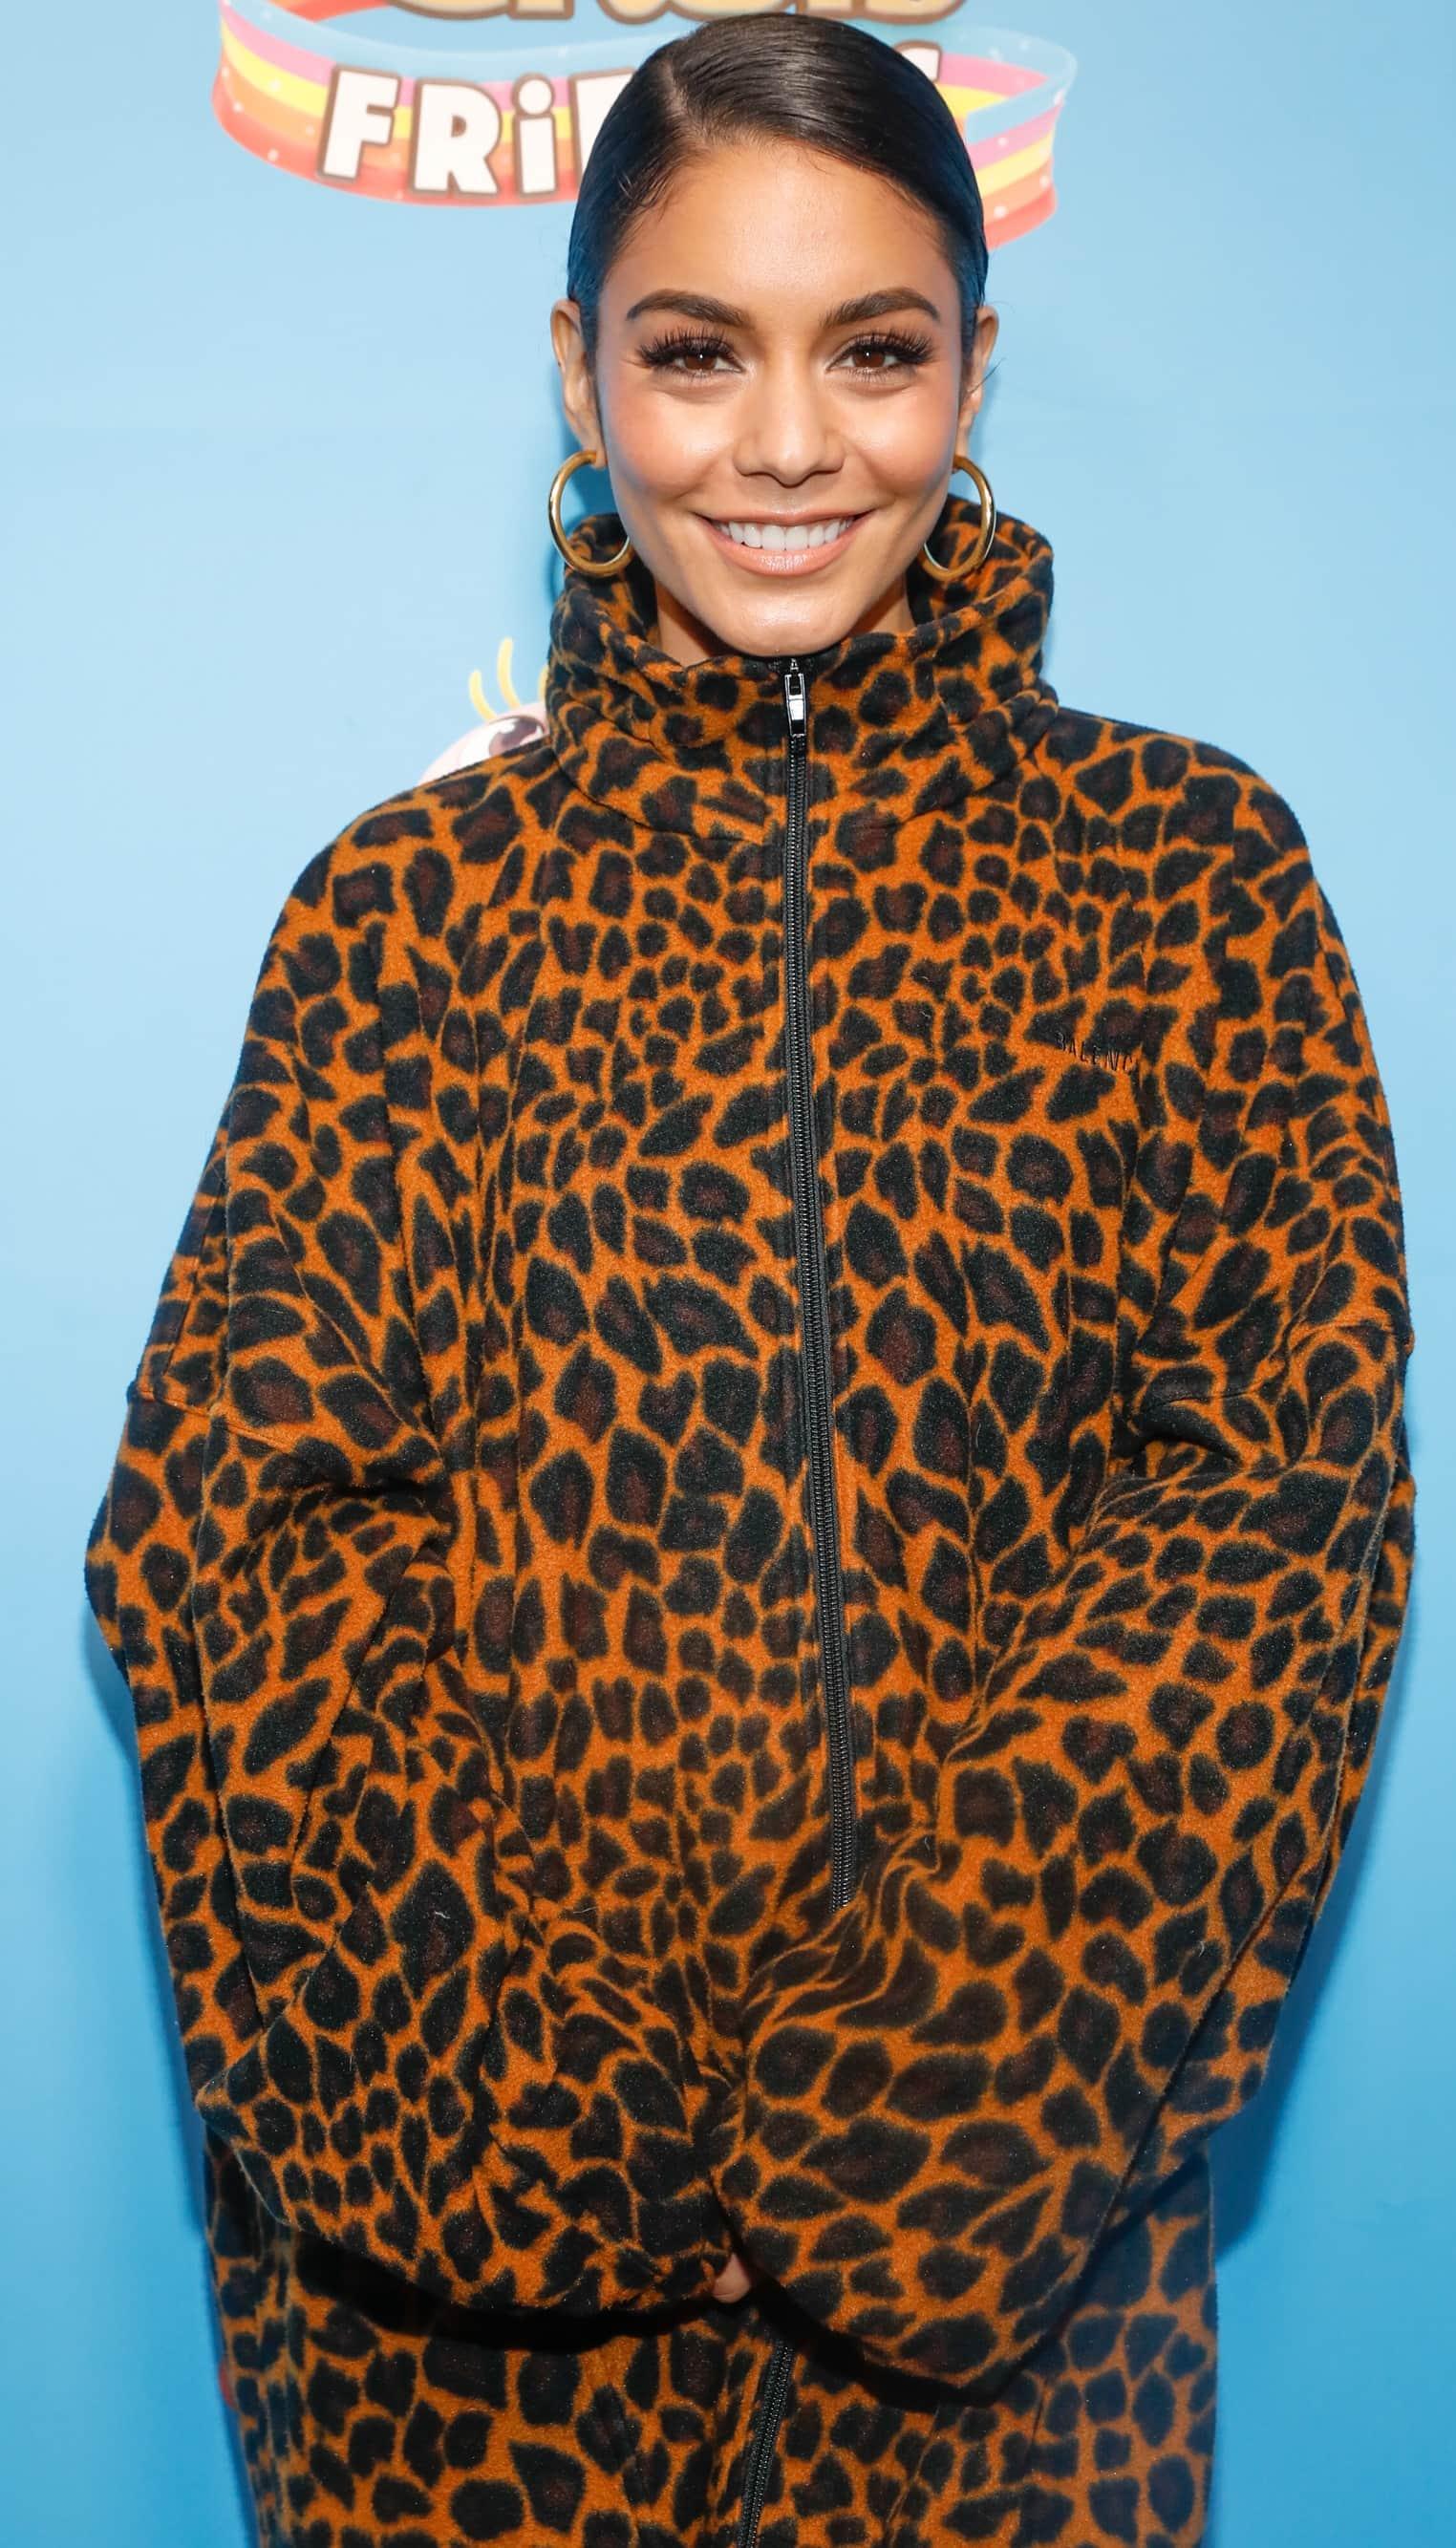 Vanessa Hudgens shows off herHera hoop earrings by Accessory Concierge